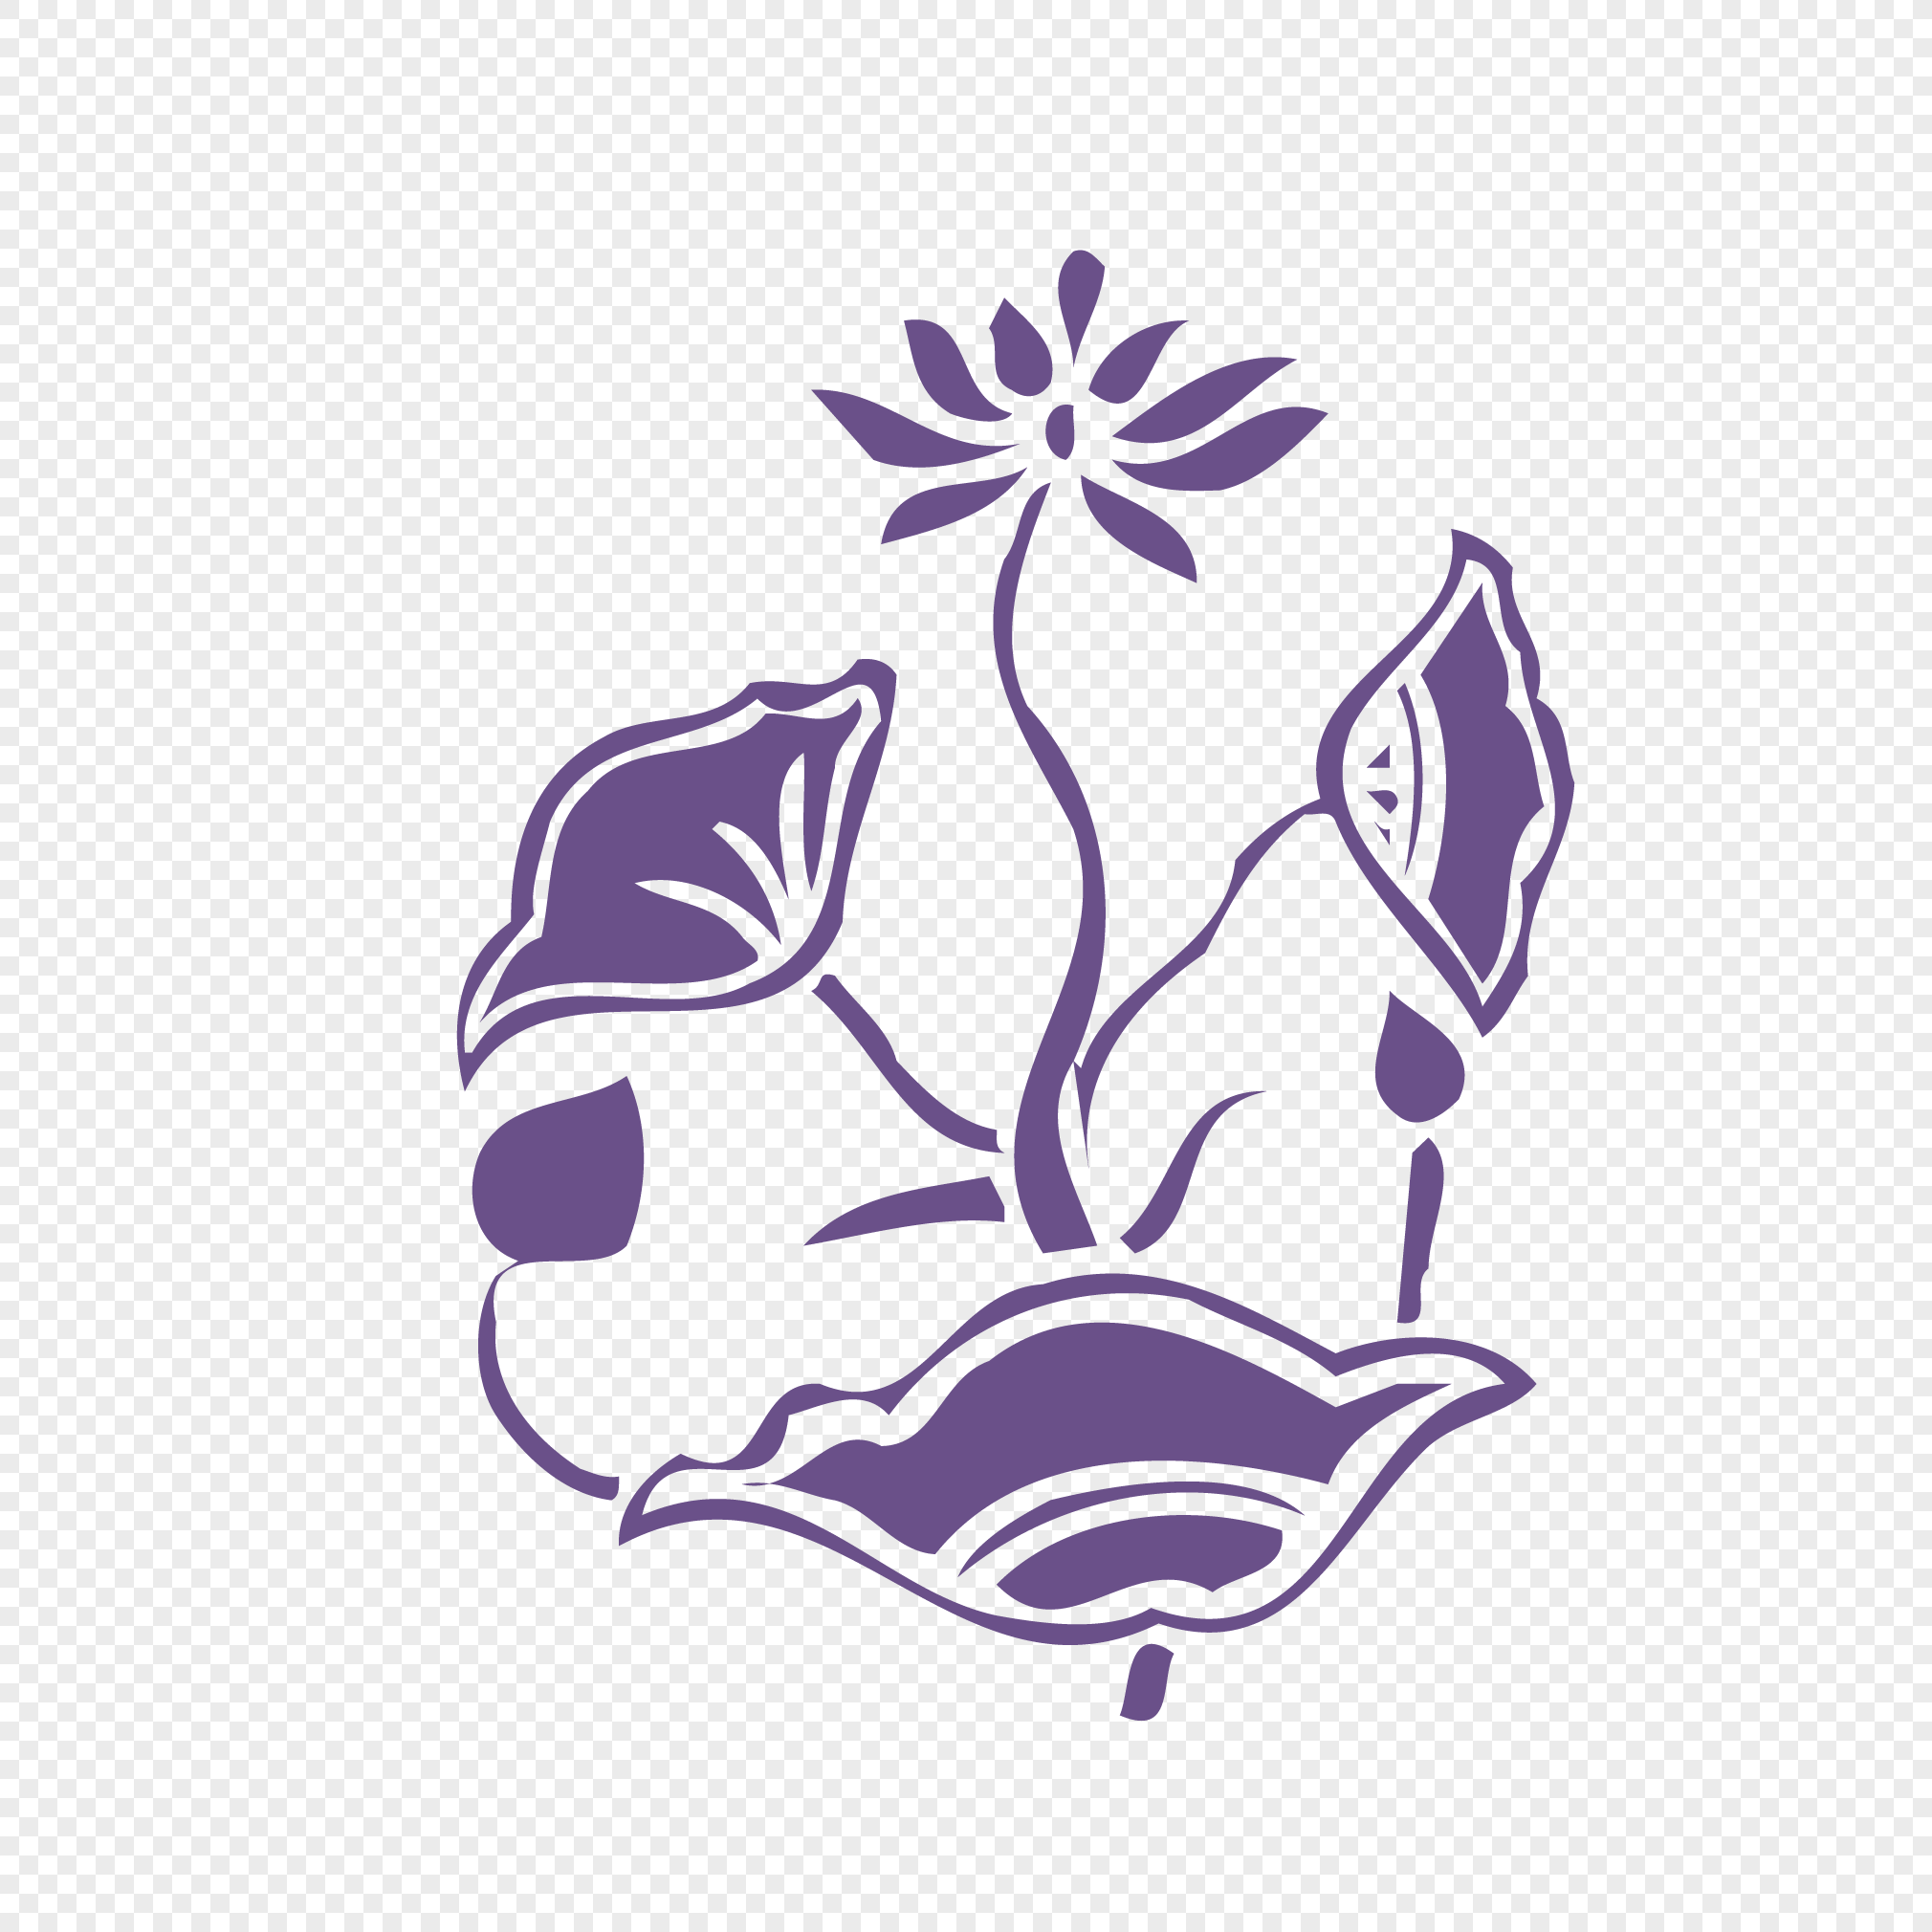 Lotus flower pattern png imagepicture free download lotus flower pattern izmirmasajfo